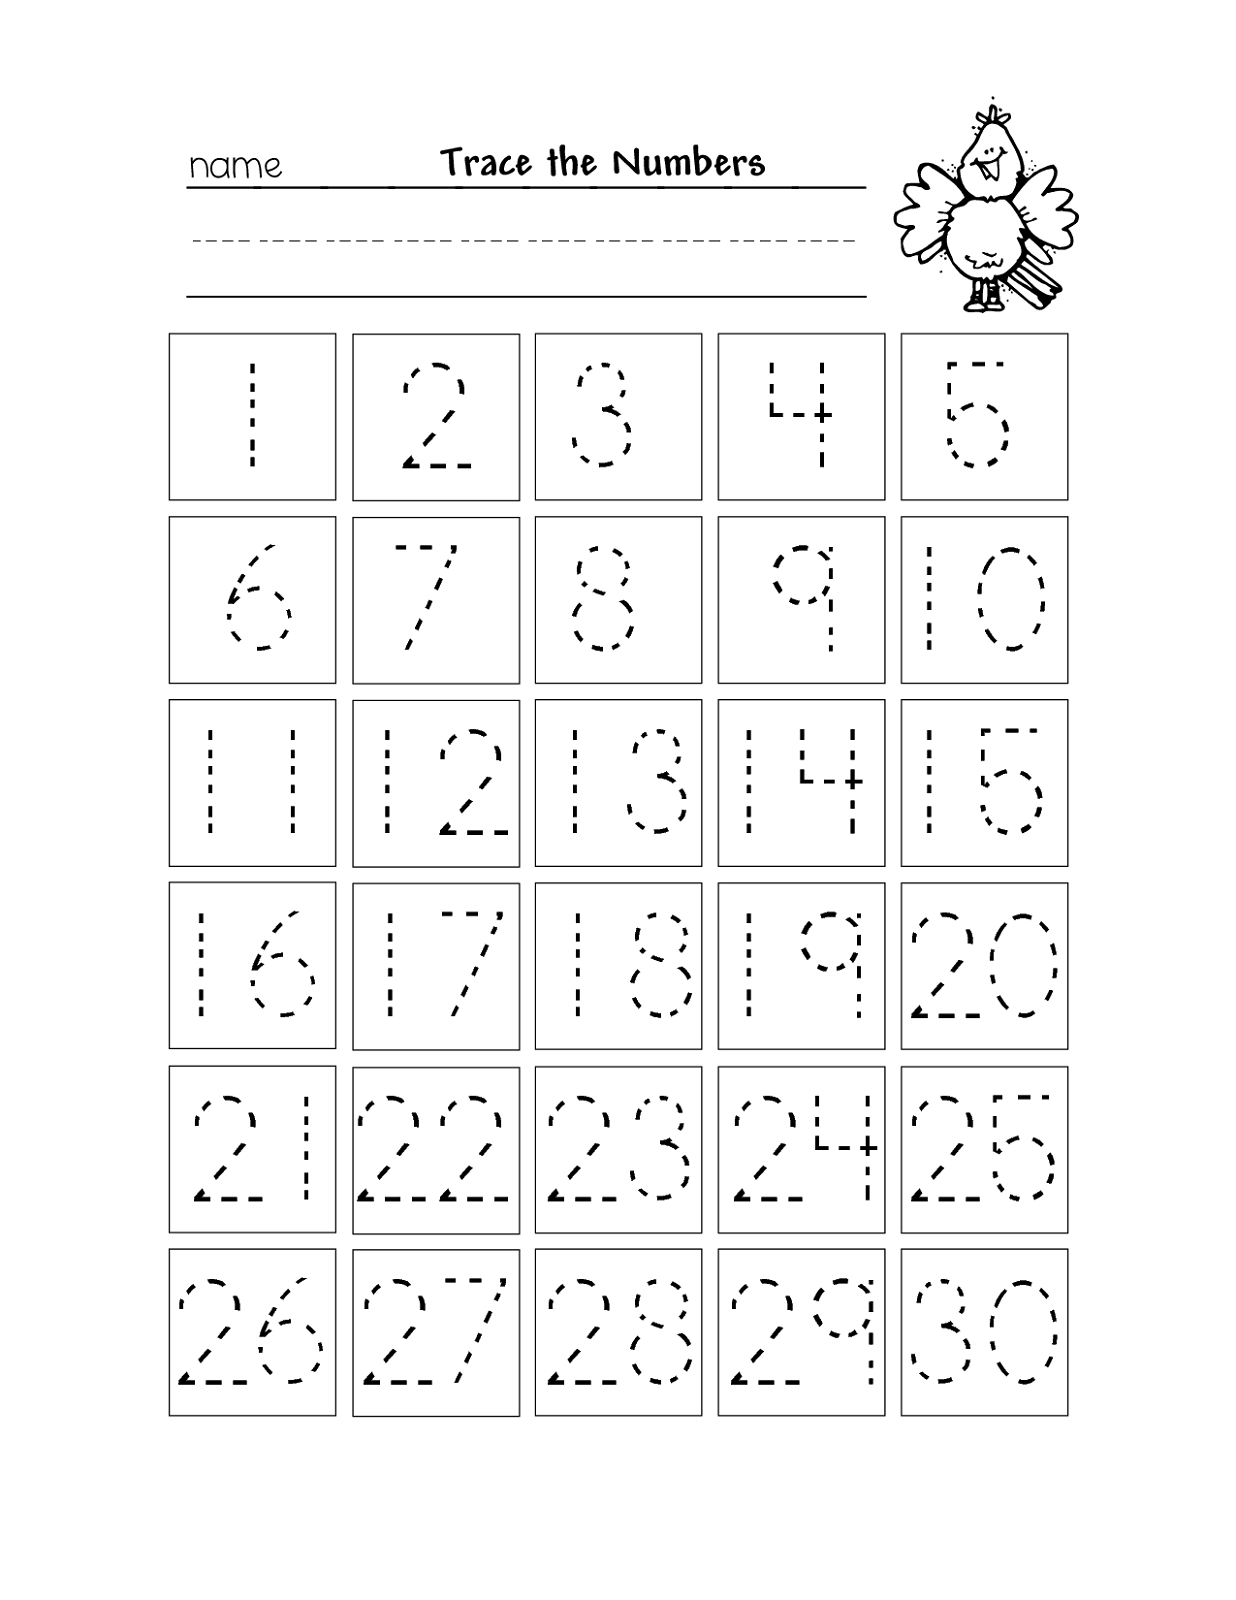 Free Printable Number Chart 1-30 | Kinder | Kindergarten Worksheets | Printable Number Tracing Worksheets